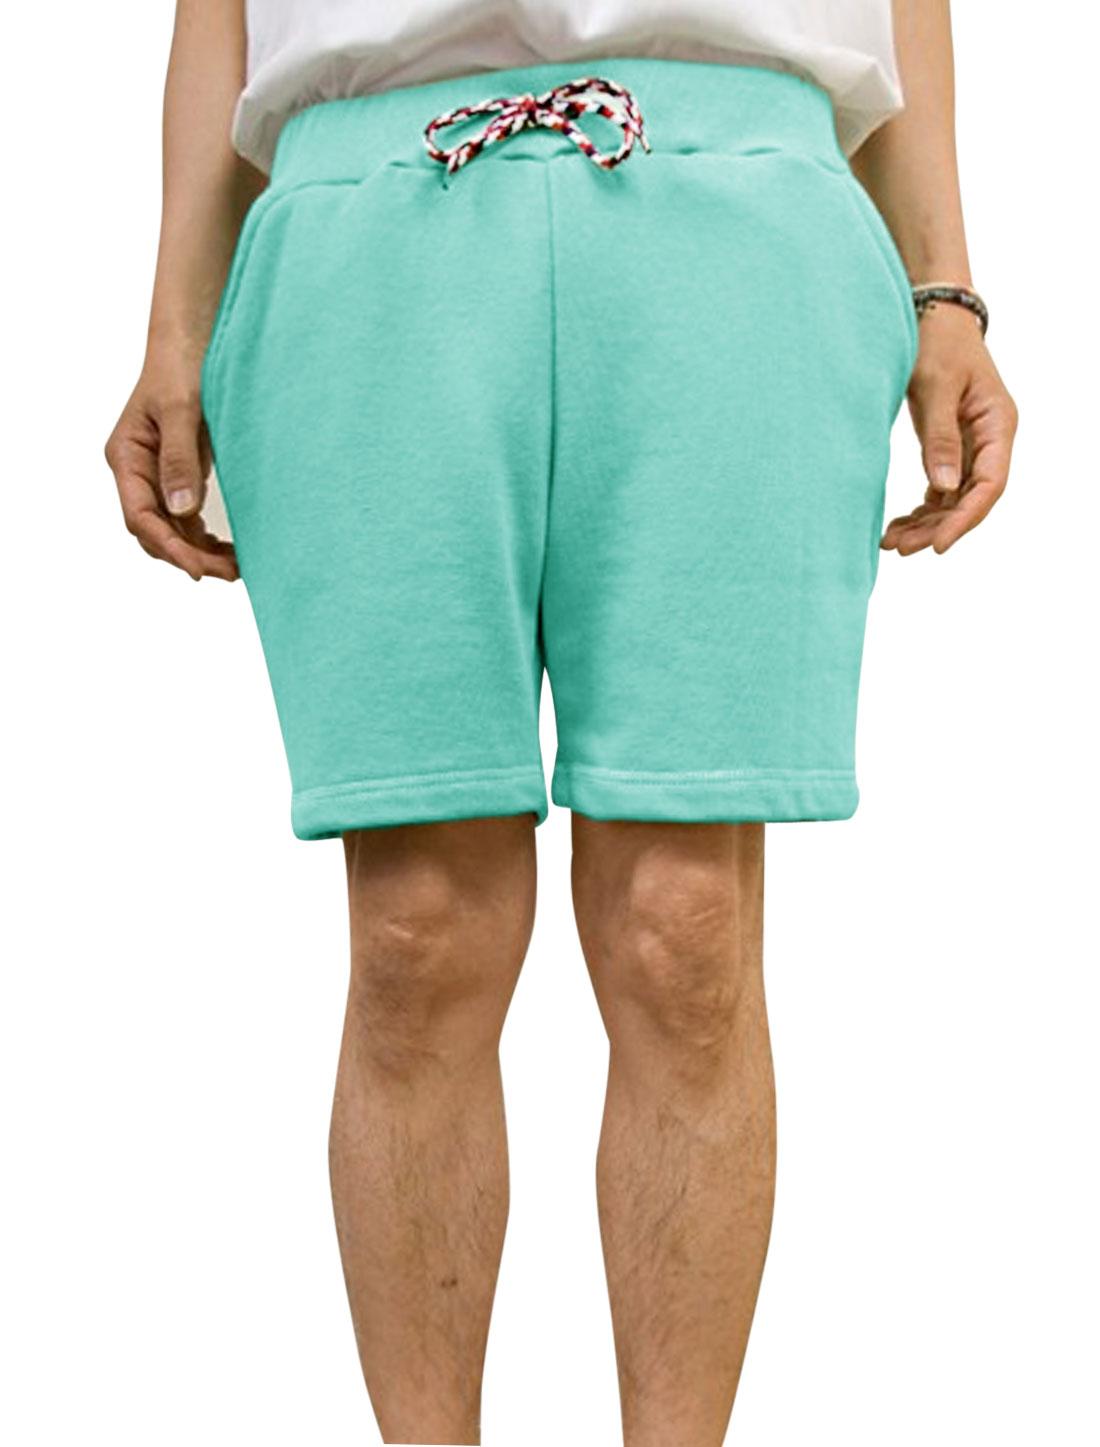 Men Leisure Braided Drawcord One Pocket Back Shorts Aqua W30